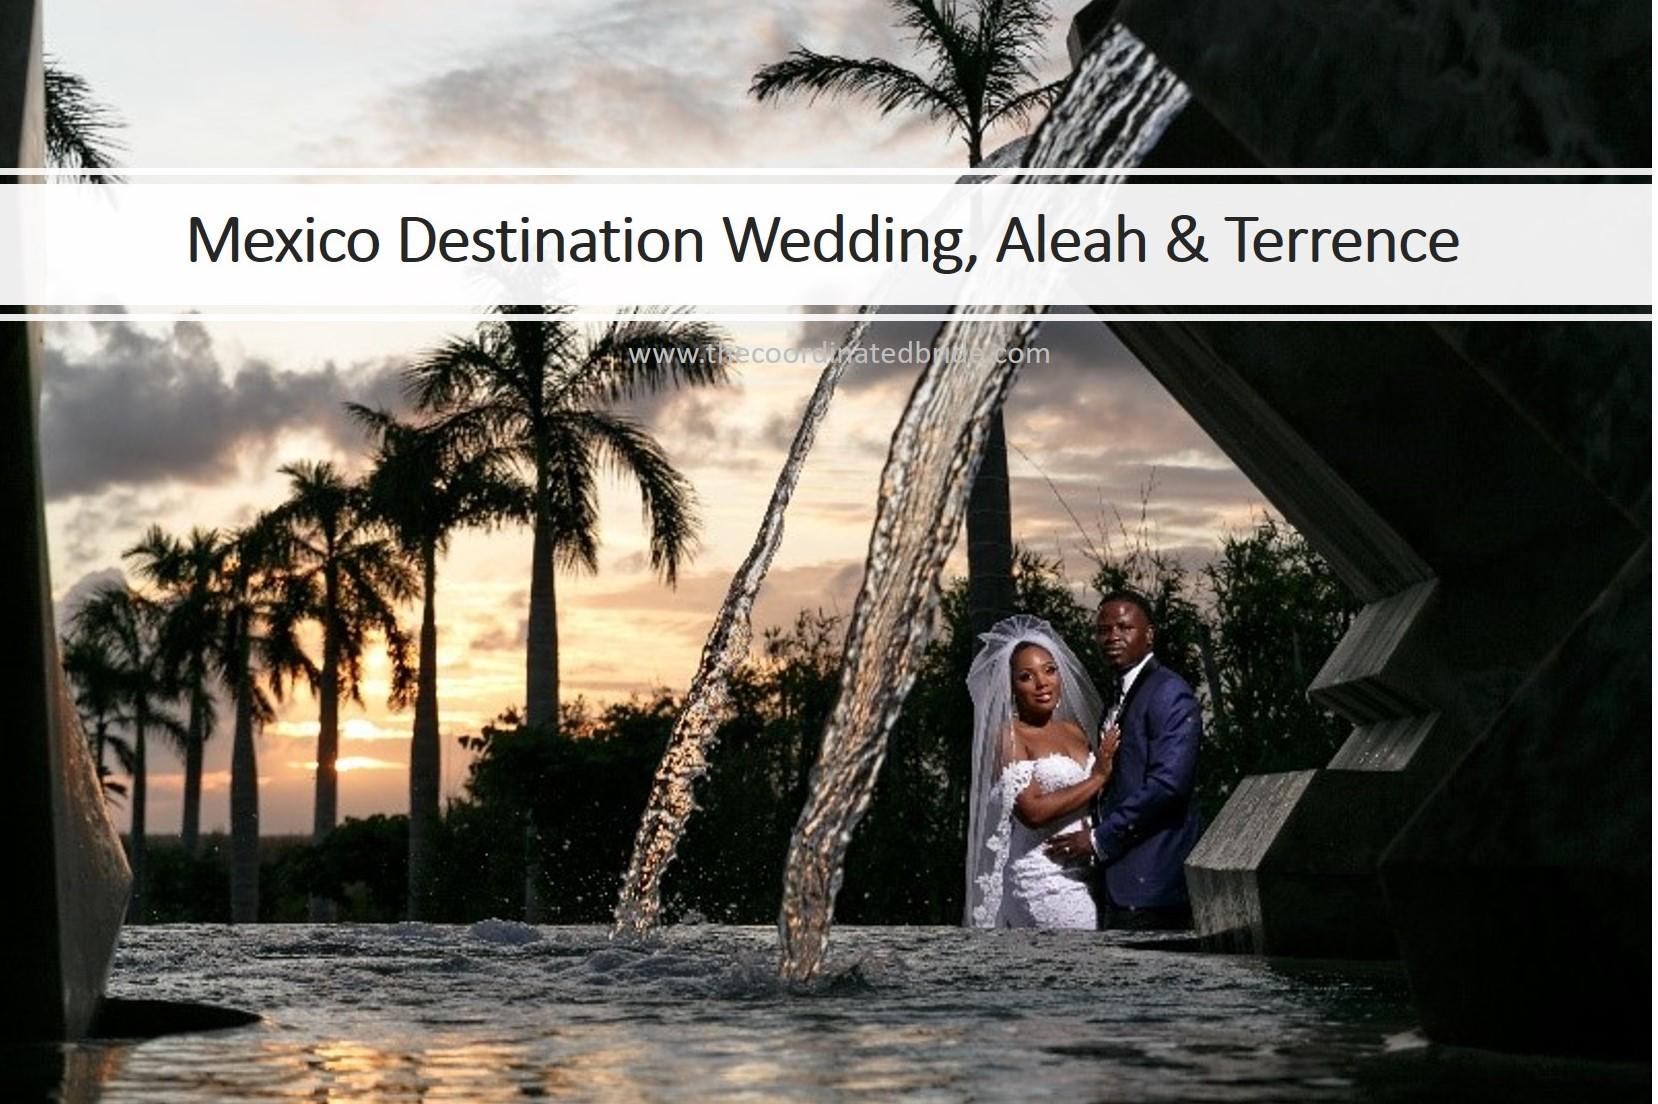 Mexico Destination Wedding, Aleah & Terrence